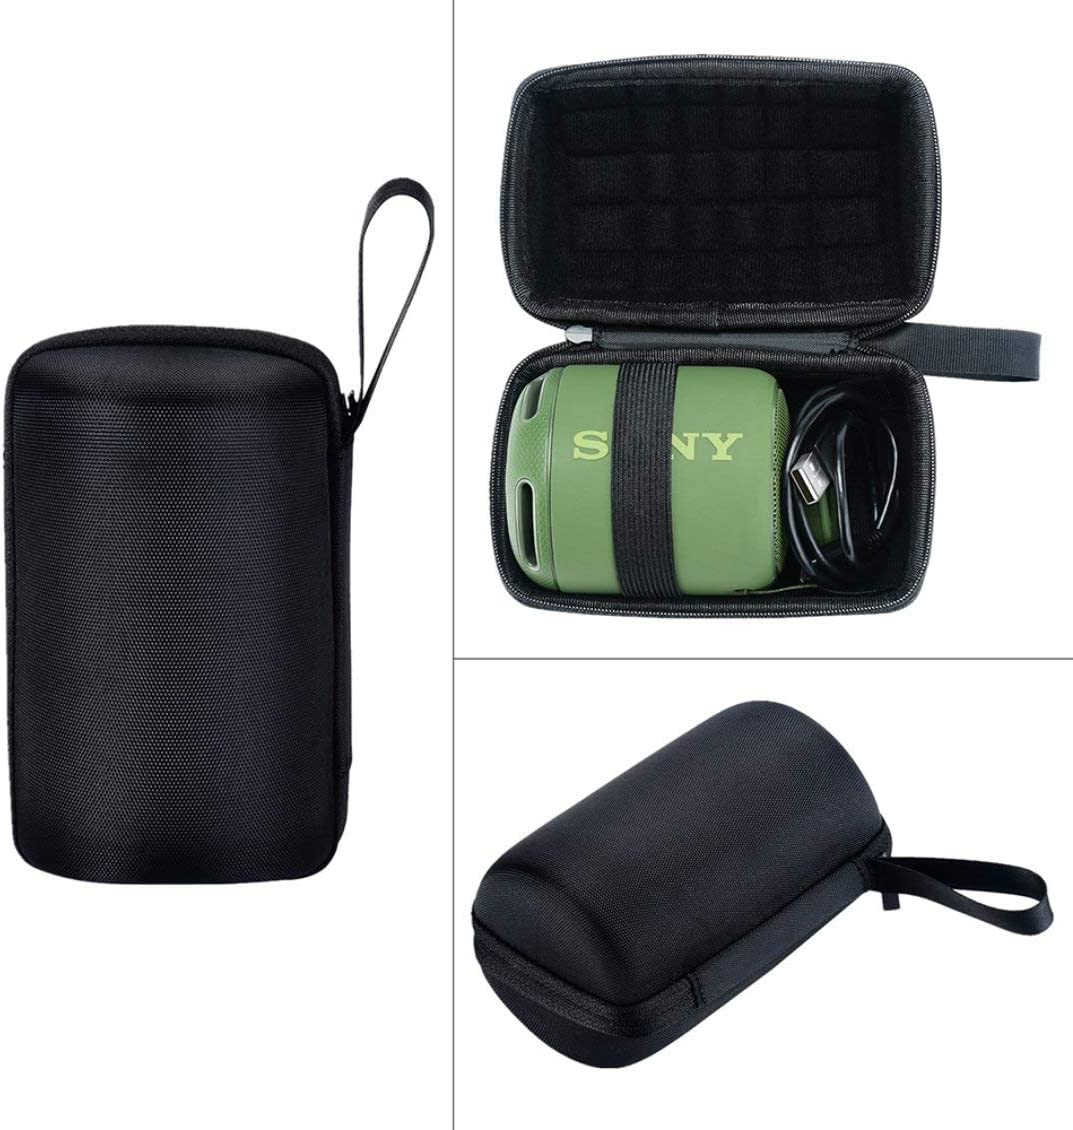 Mini Estuche portátil para Altavoces inalámbricos a Prueba de Golpes para Sony SRS-XB10 Estuche portátil para Altavoces: Amazon.es: Electrónica